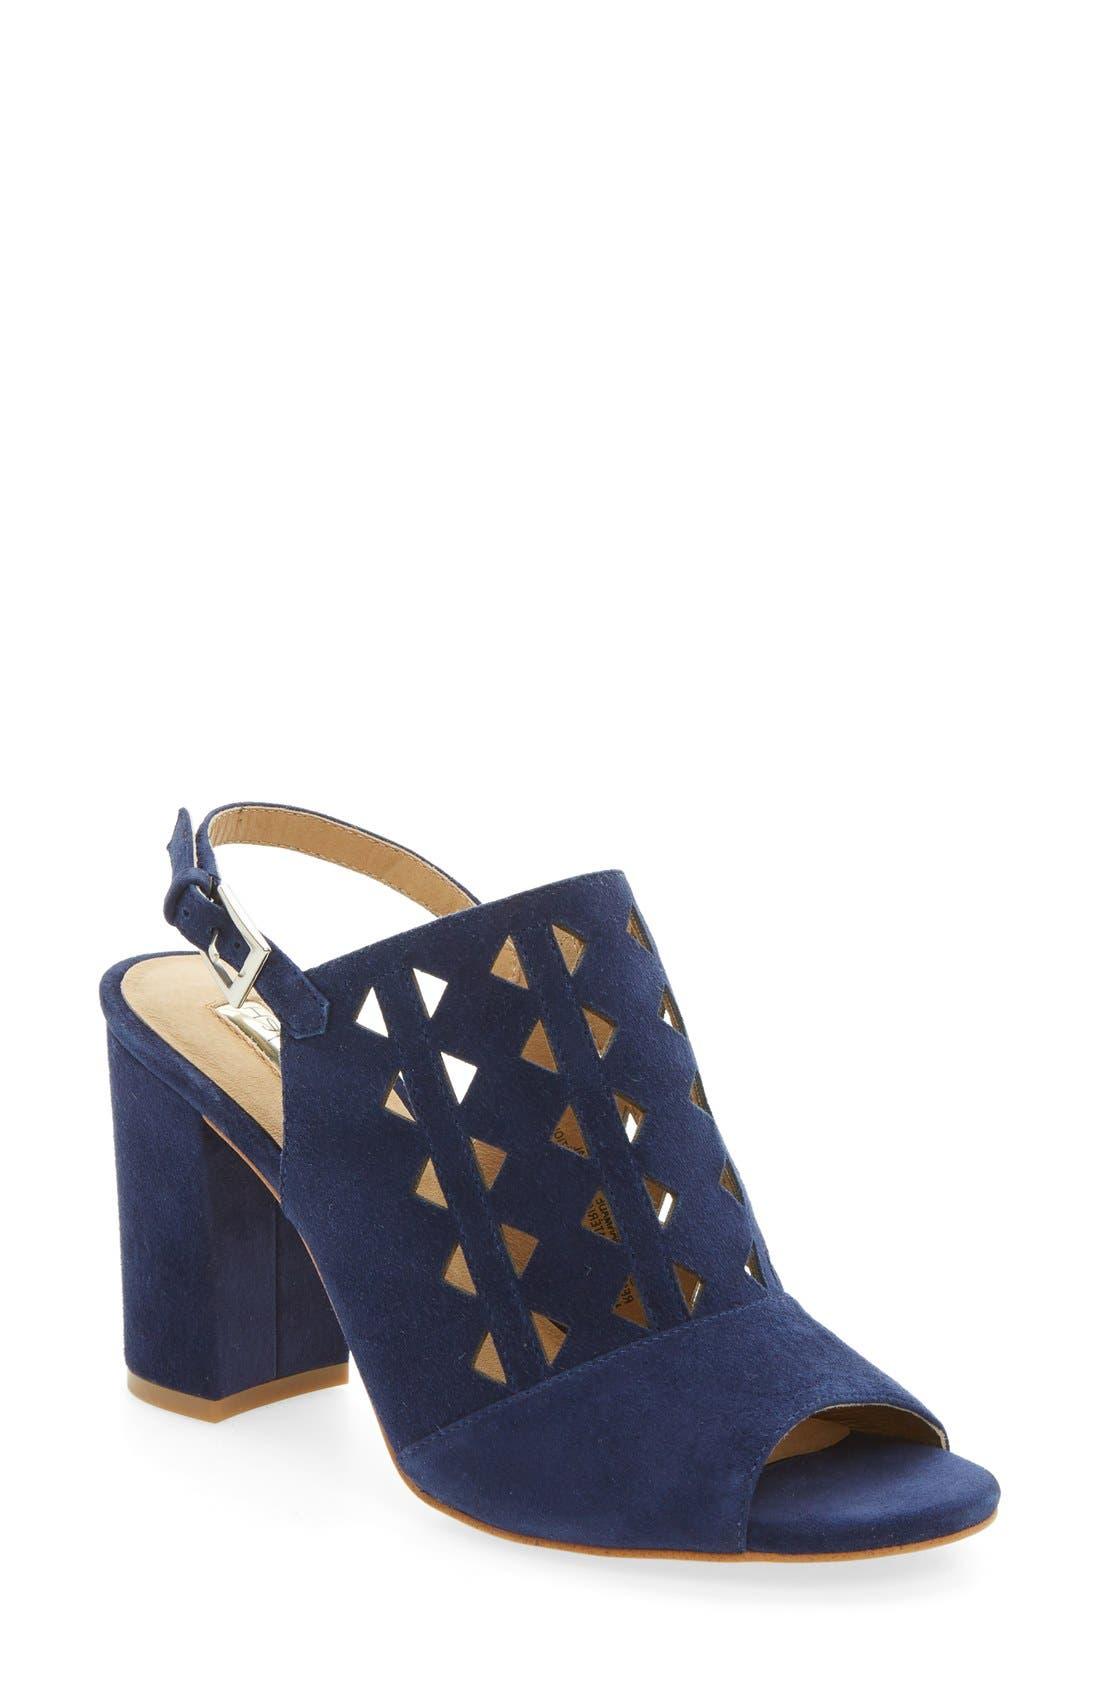 Main Image - Halogen® Zoey Slingback Sandal (Women)